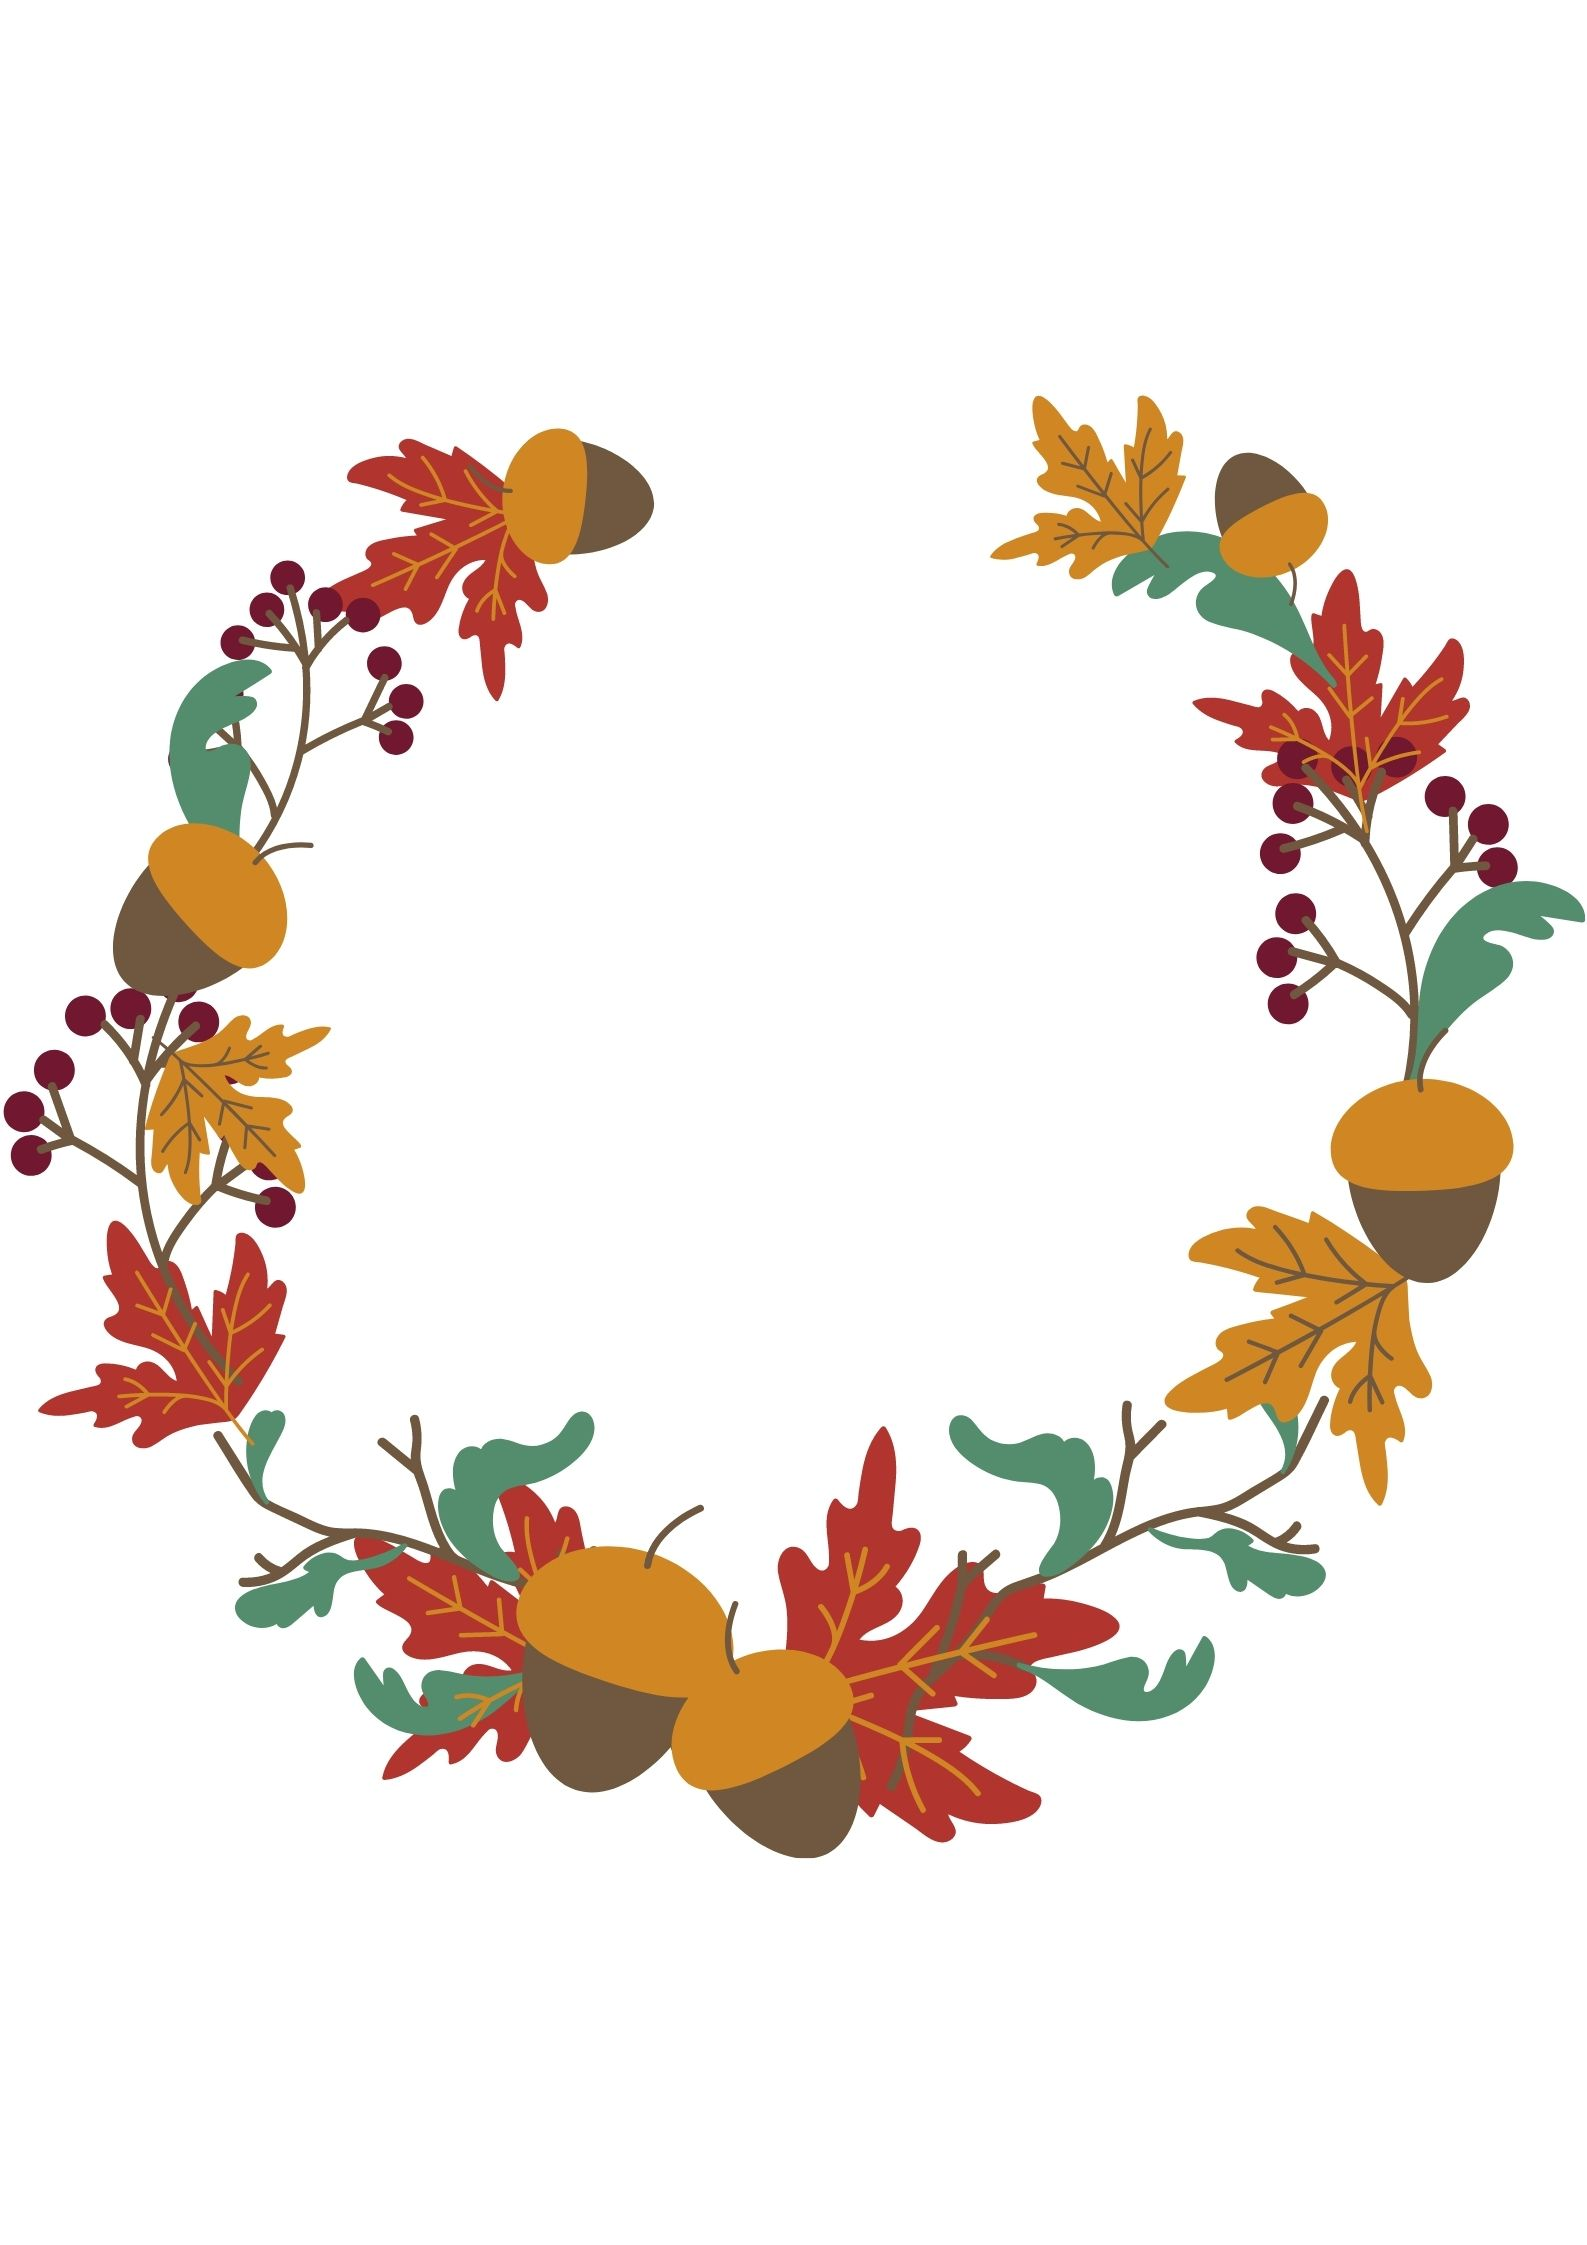 GHIRLANDA GHIRLANDE Disegni autunno da scaricare